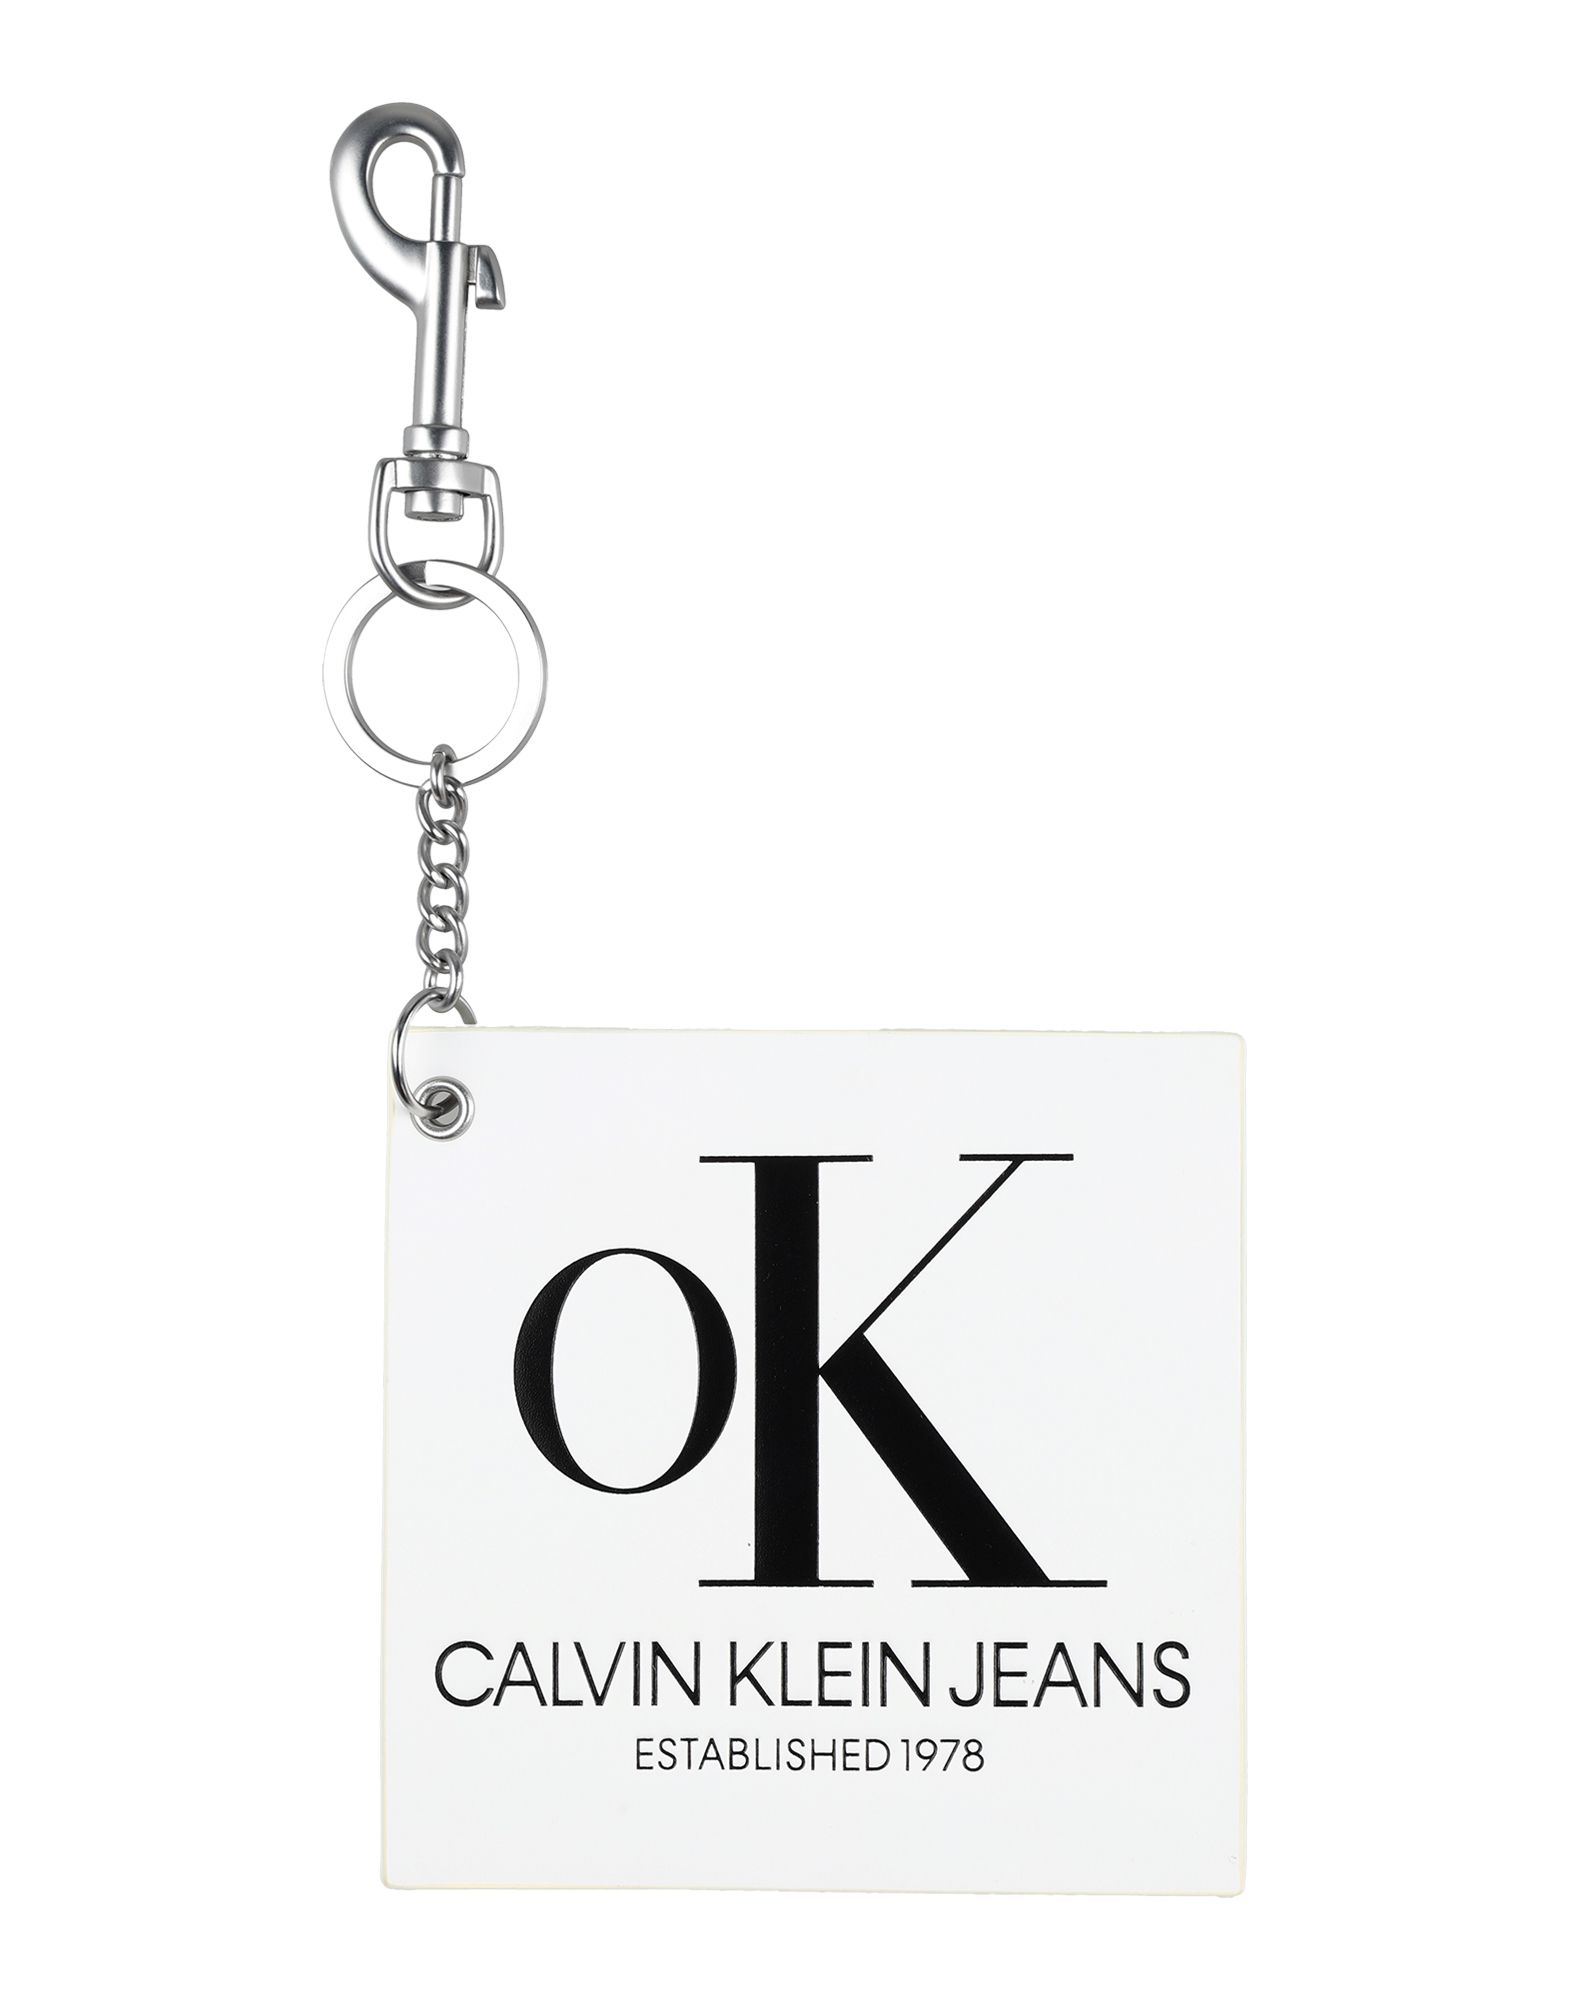 CALVIN KLEIN JEANS Брелок для ключей calvin klein jeans джинсы calvin klein jeans j3ij3 03478 914